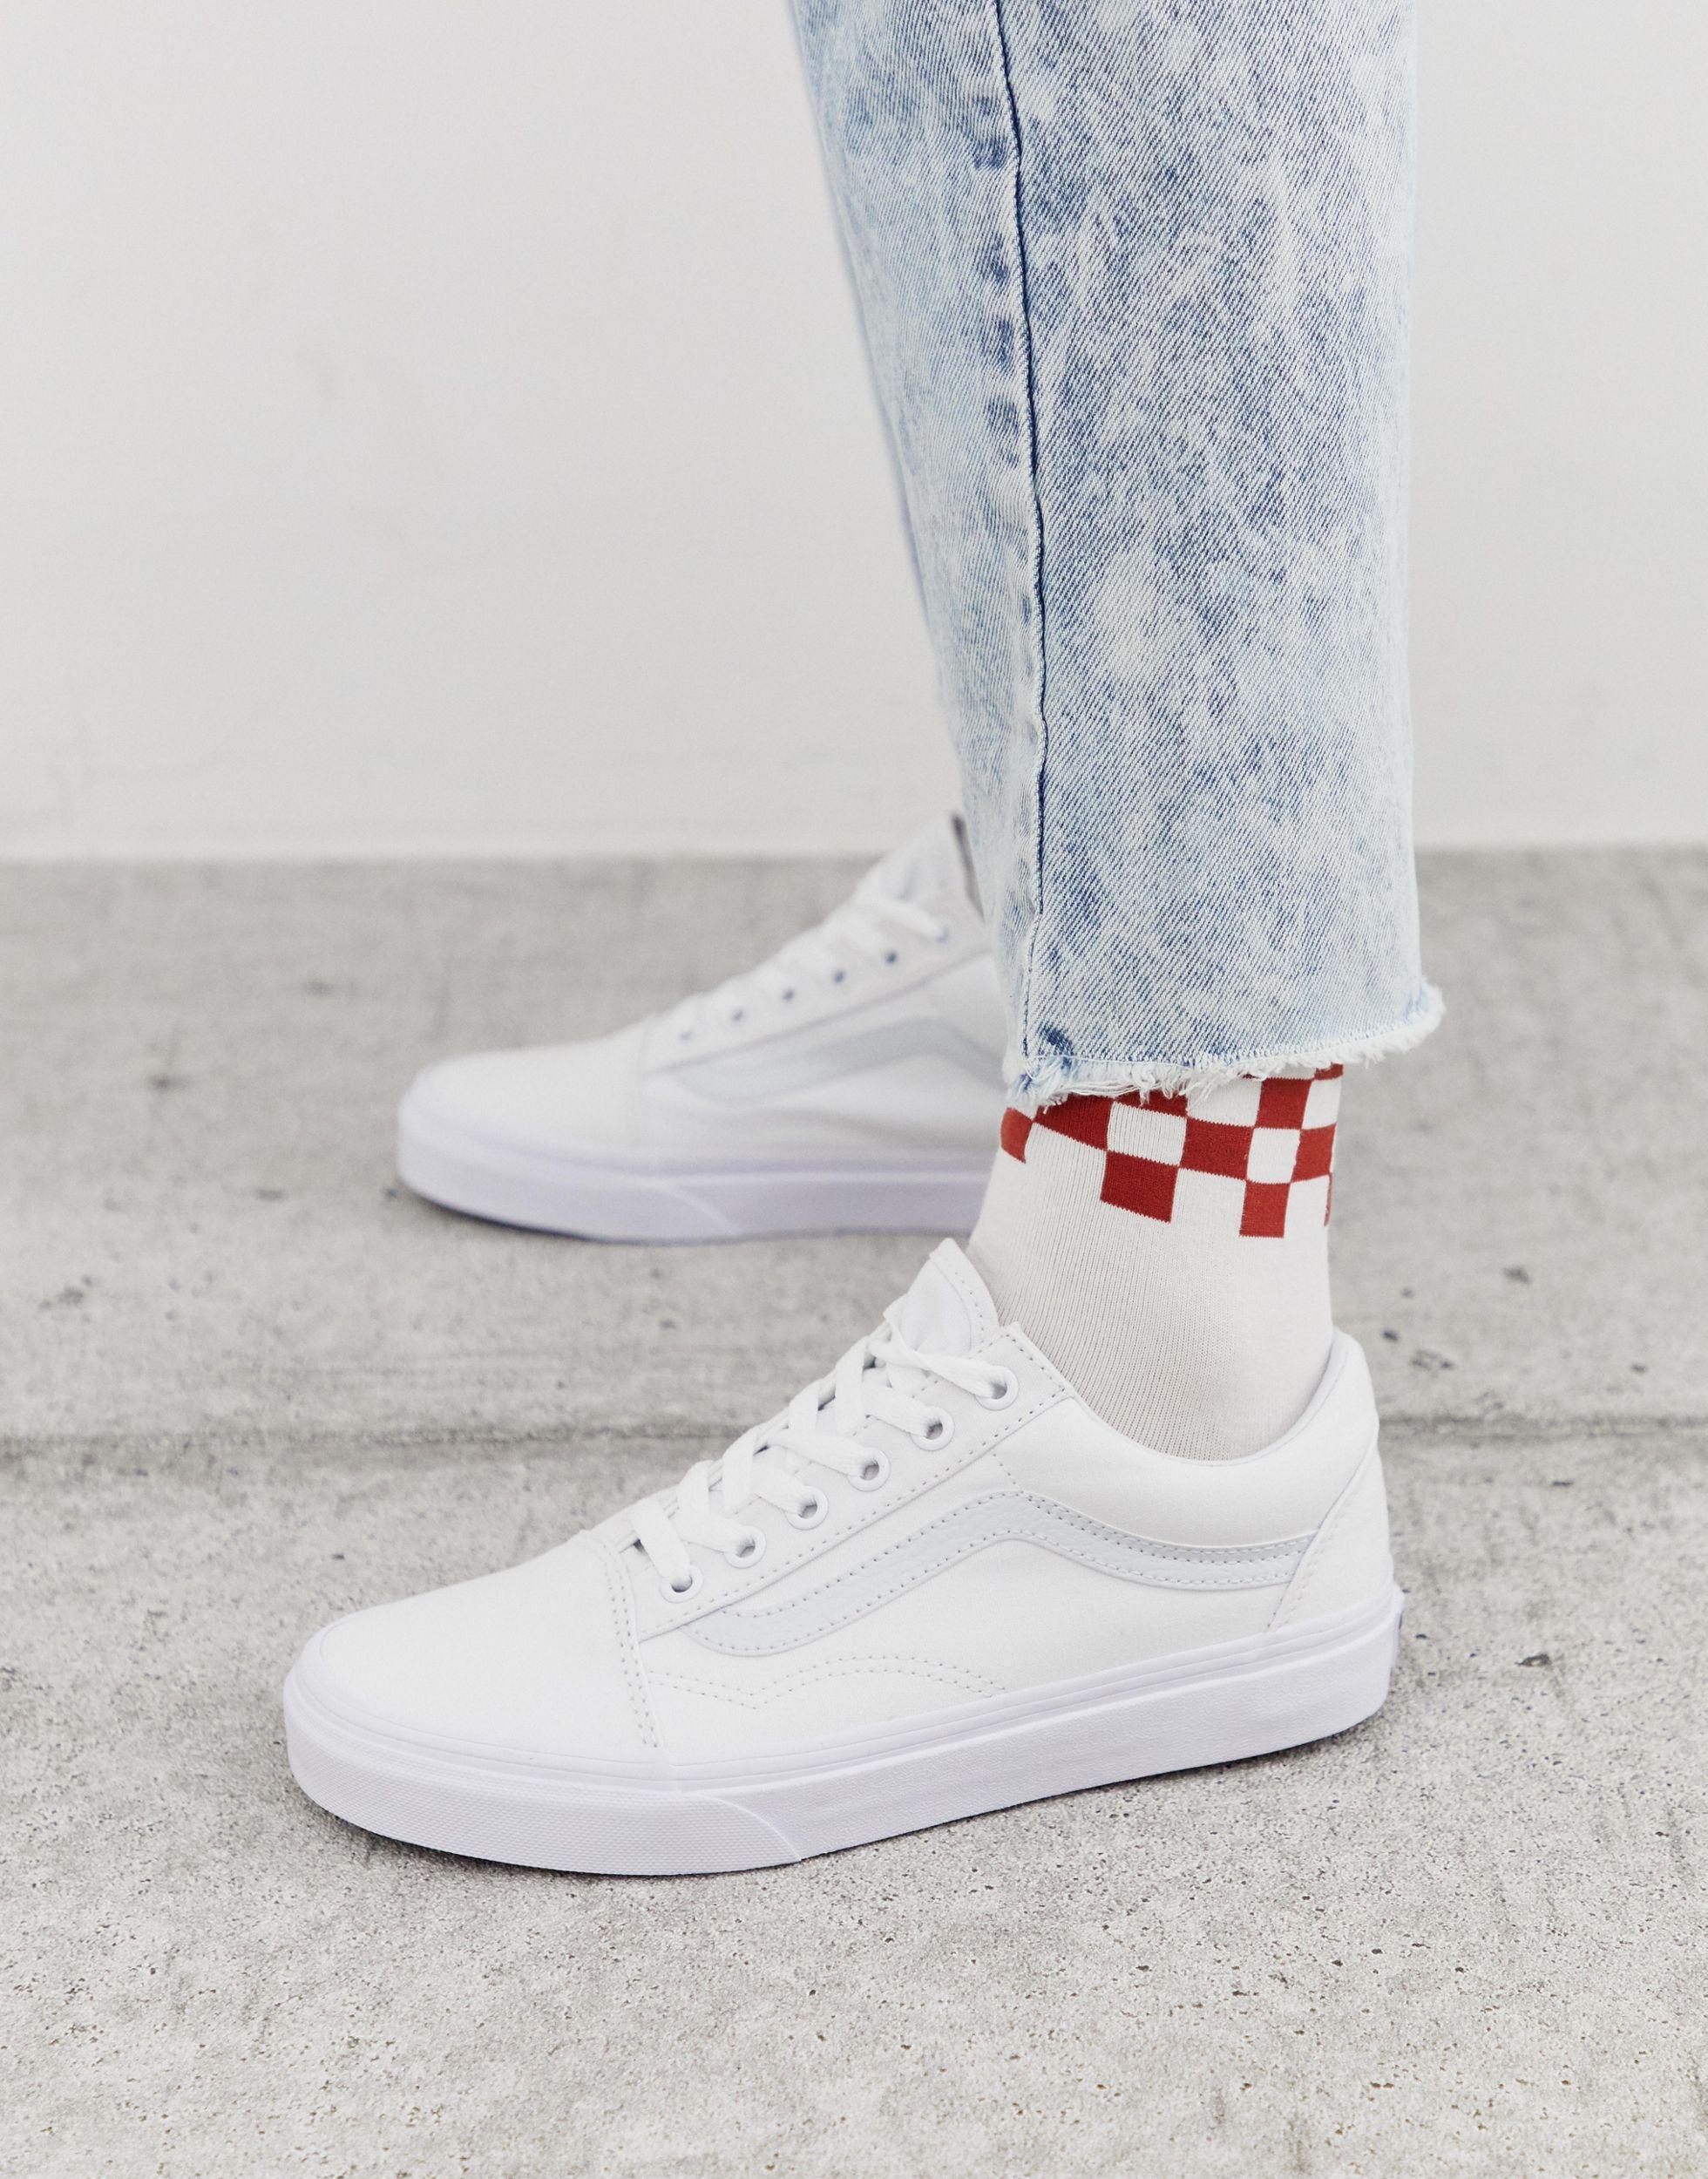 Classic Old Skool Triple White Sneakers